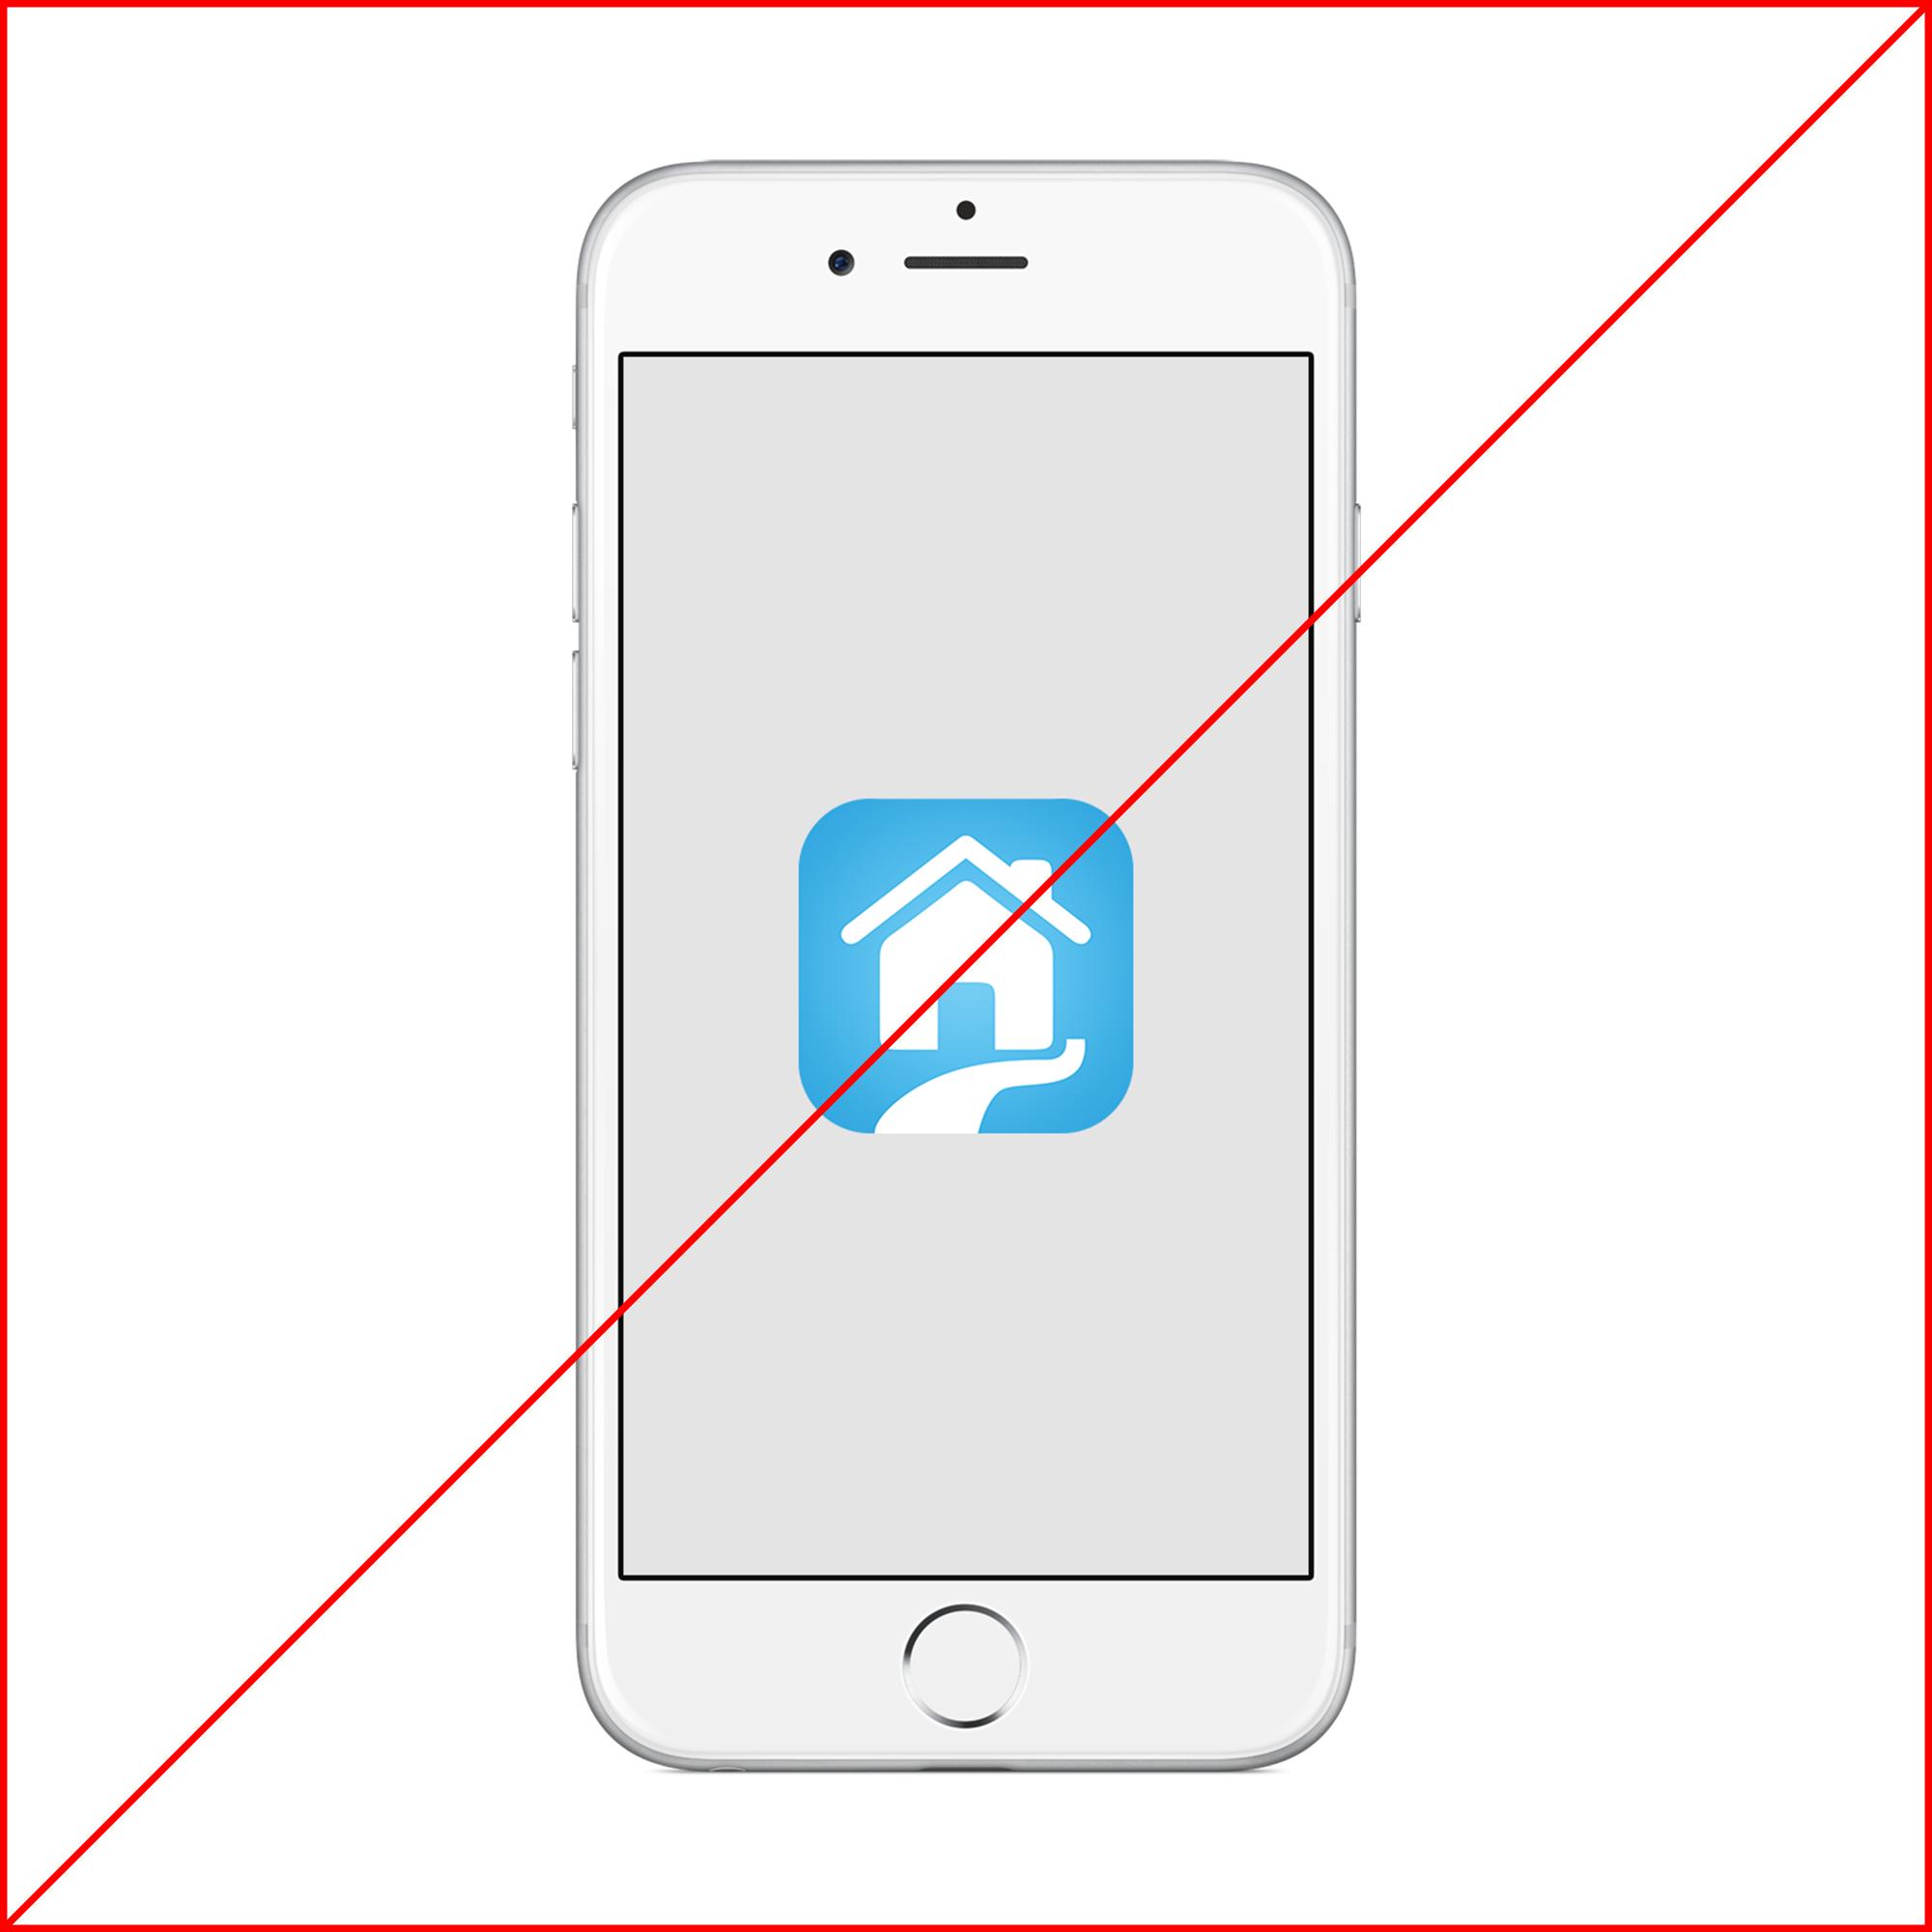 Don't use placeholder artwork